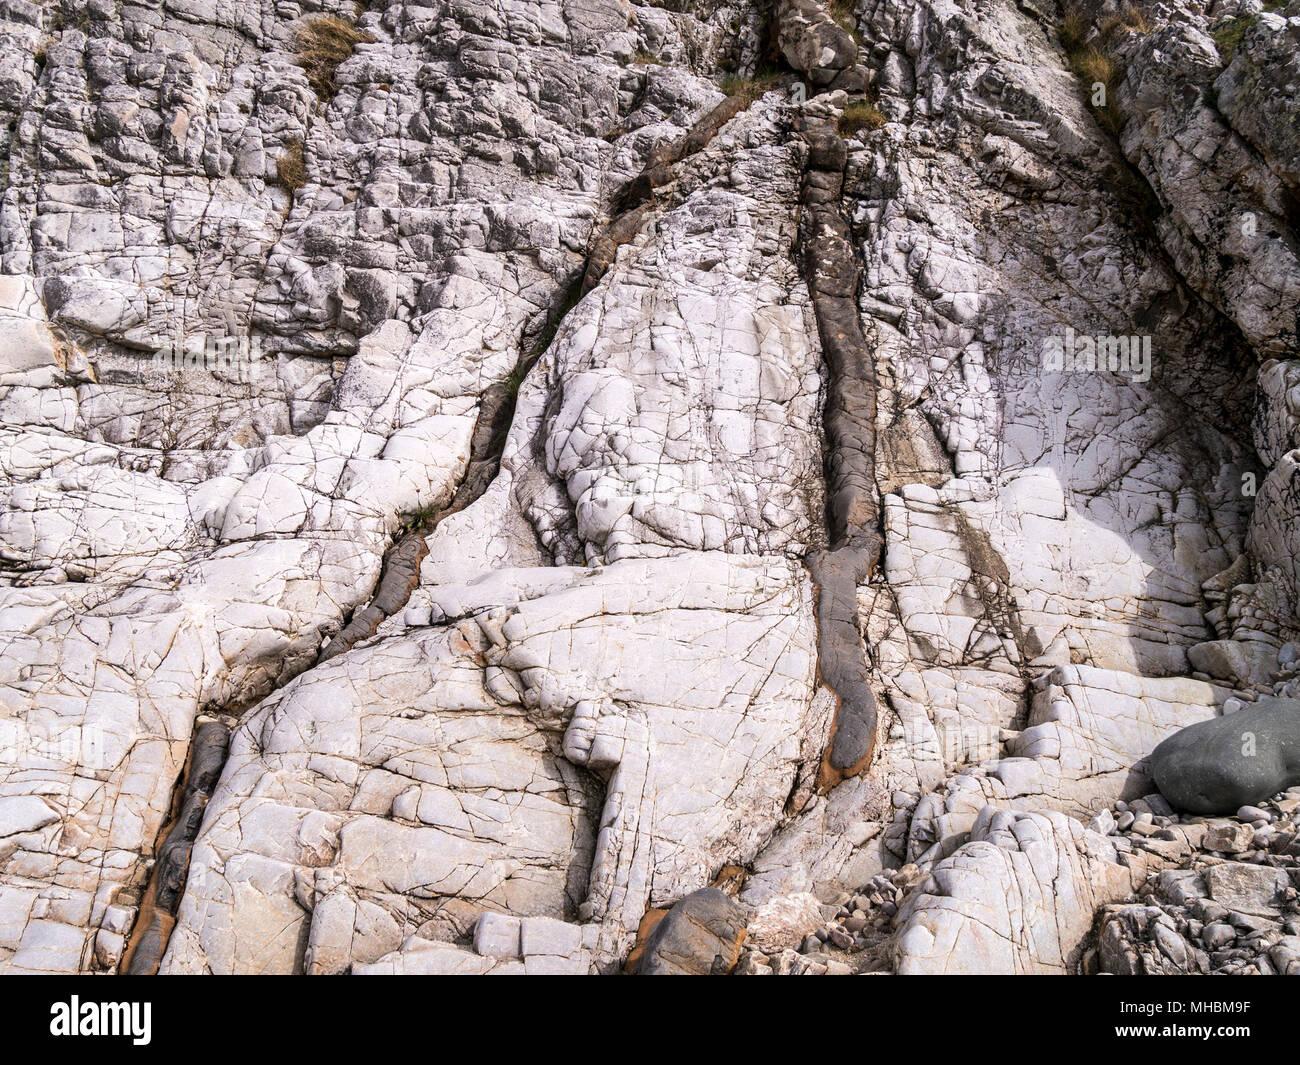 Small veins of dark palaeogene igneous basalt intrusion forming cracks in lighter colour sedimentary arenite bedrock, Ord, Isle of Skye, Scotland, UK - Stock Image